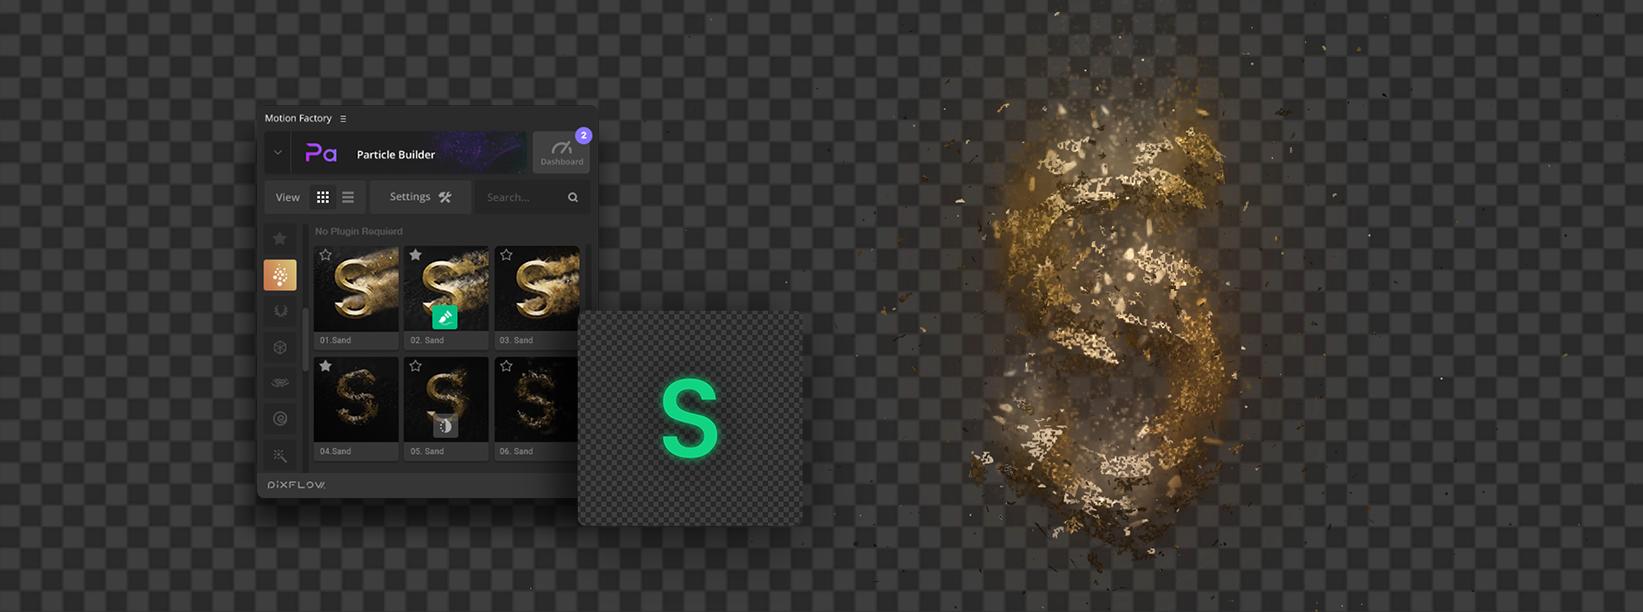 Particle Builder | Sand Pack: Dust Sand Storm Disintegration Effect VFX Generator - Alpha Tool